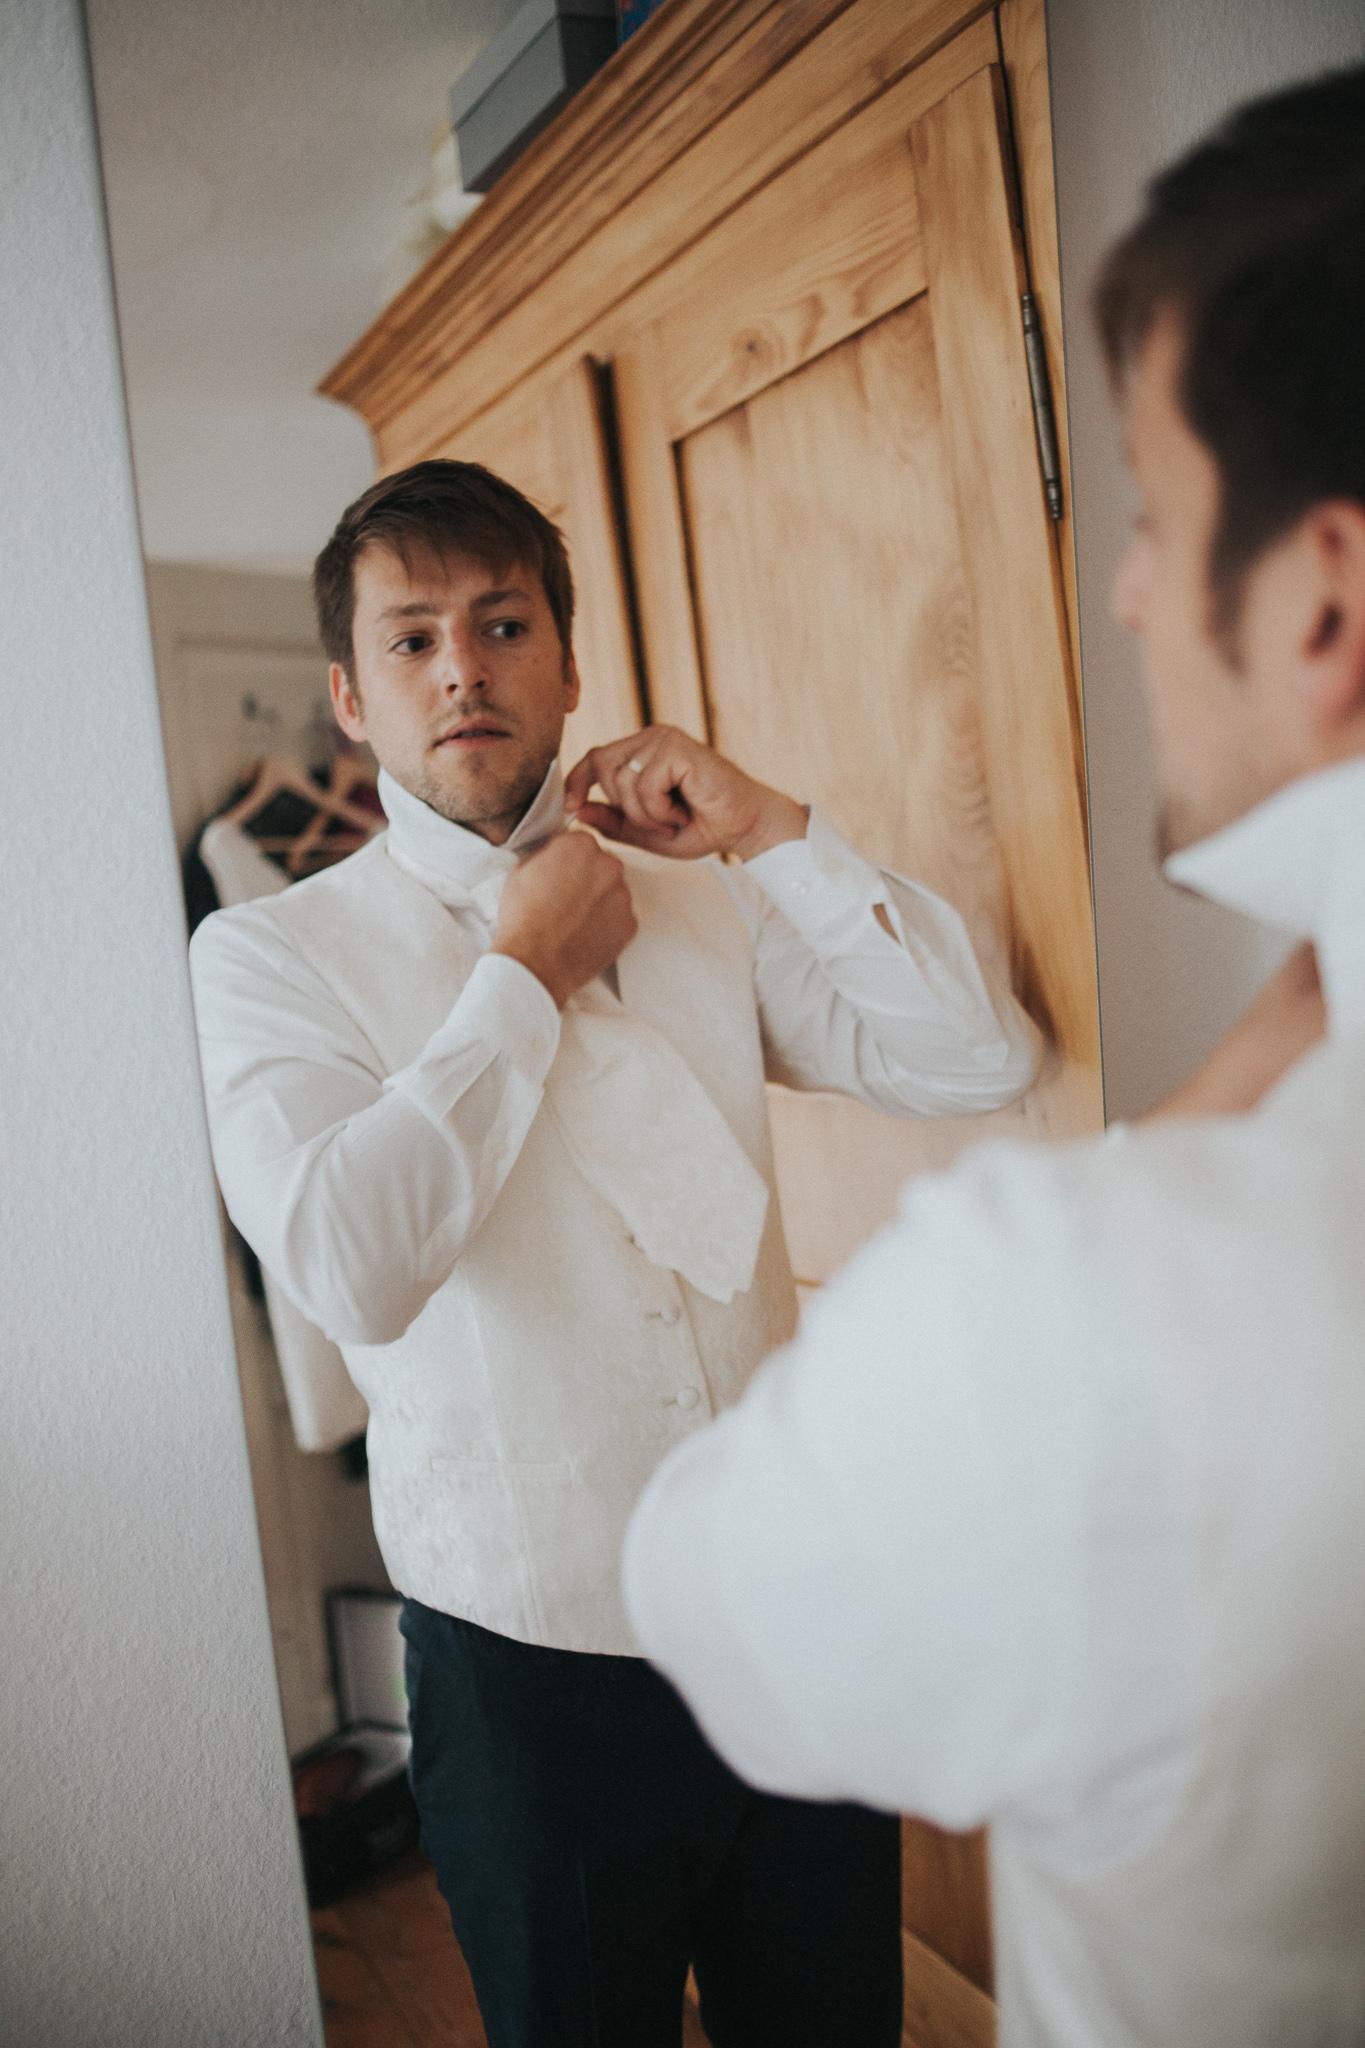 Getting Ready Mann bindet Krawatte